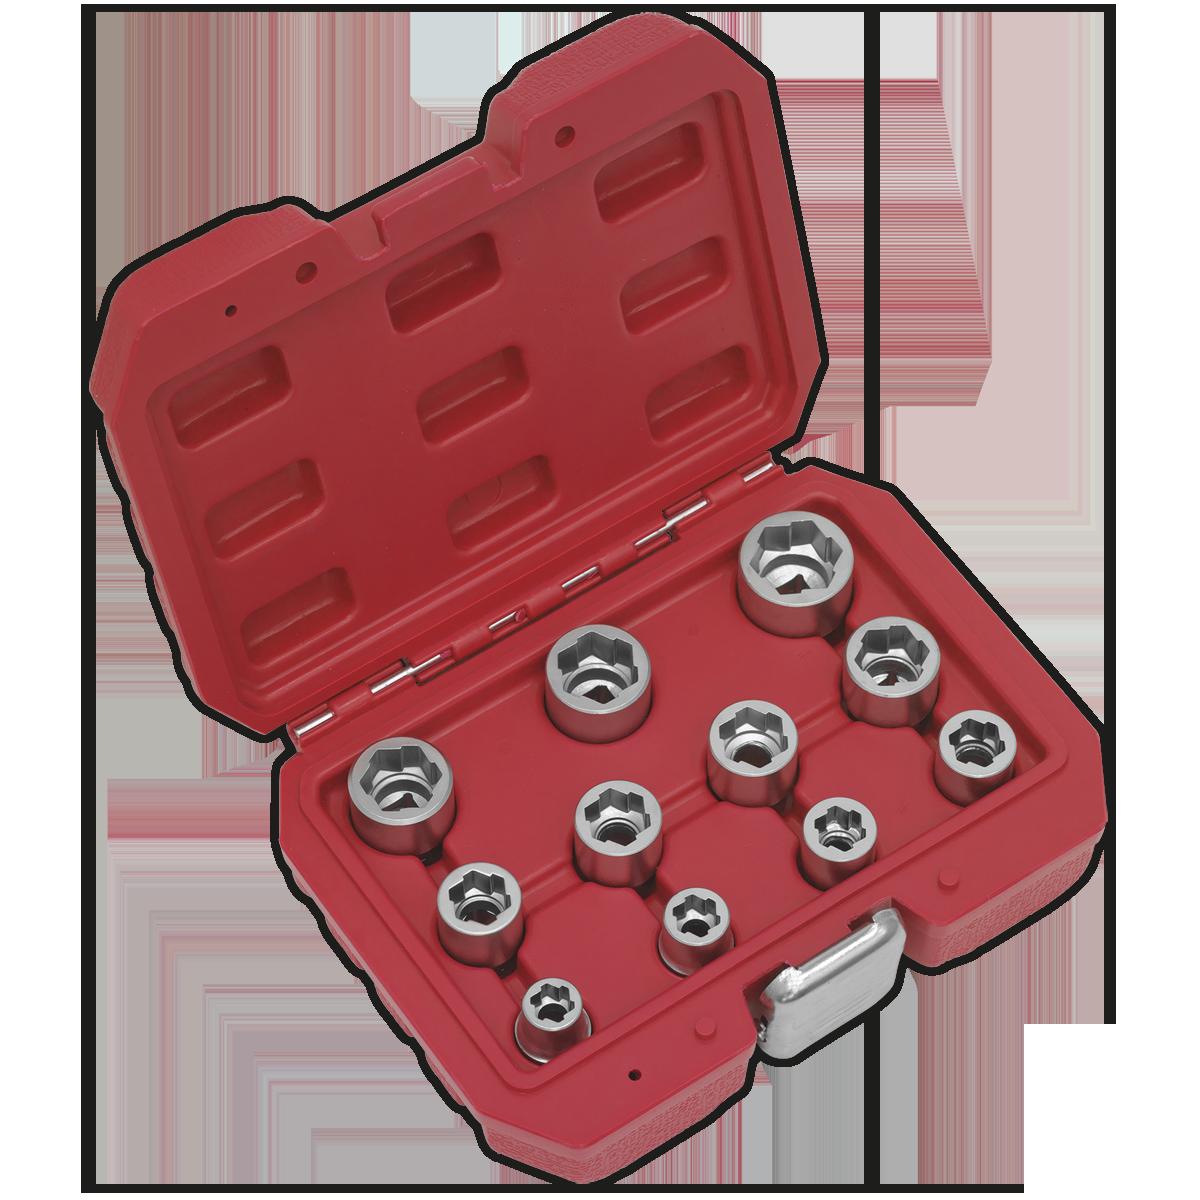 "Bolt Extractor Socket Set 11pc 3/8""Sq Drive Metric"